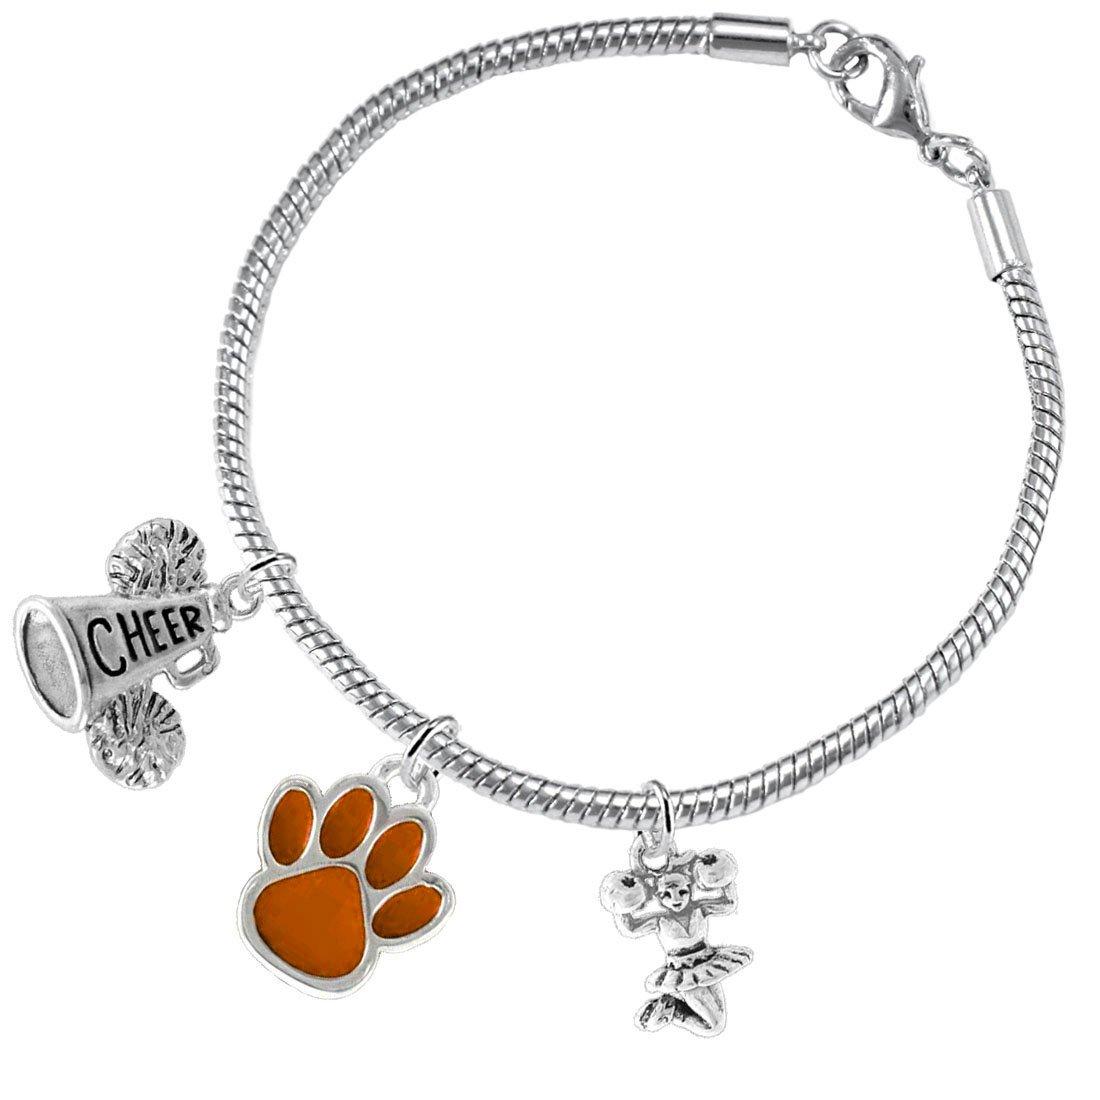 Lead and Cadmium Free Nickel Orange Paw Cheer 3 Charm Bracelet Safe-Hypoallergenic